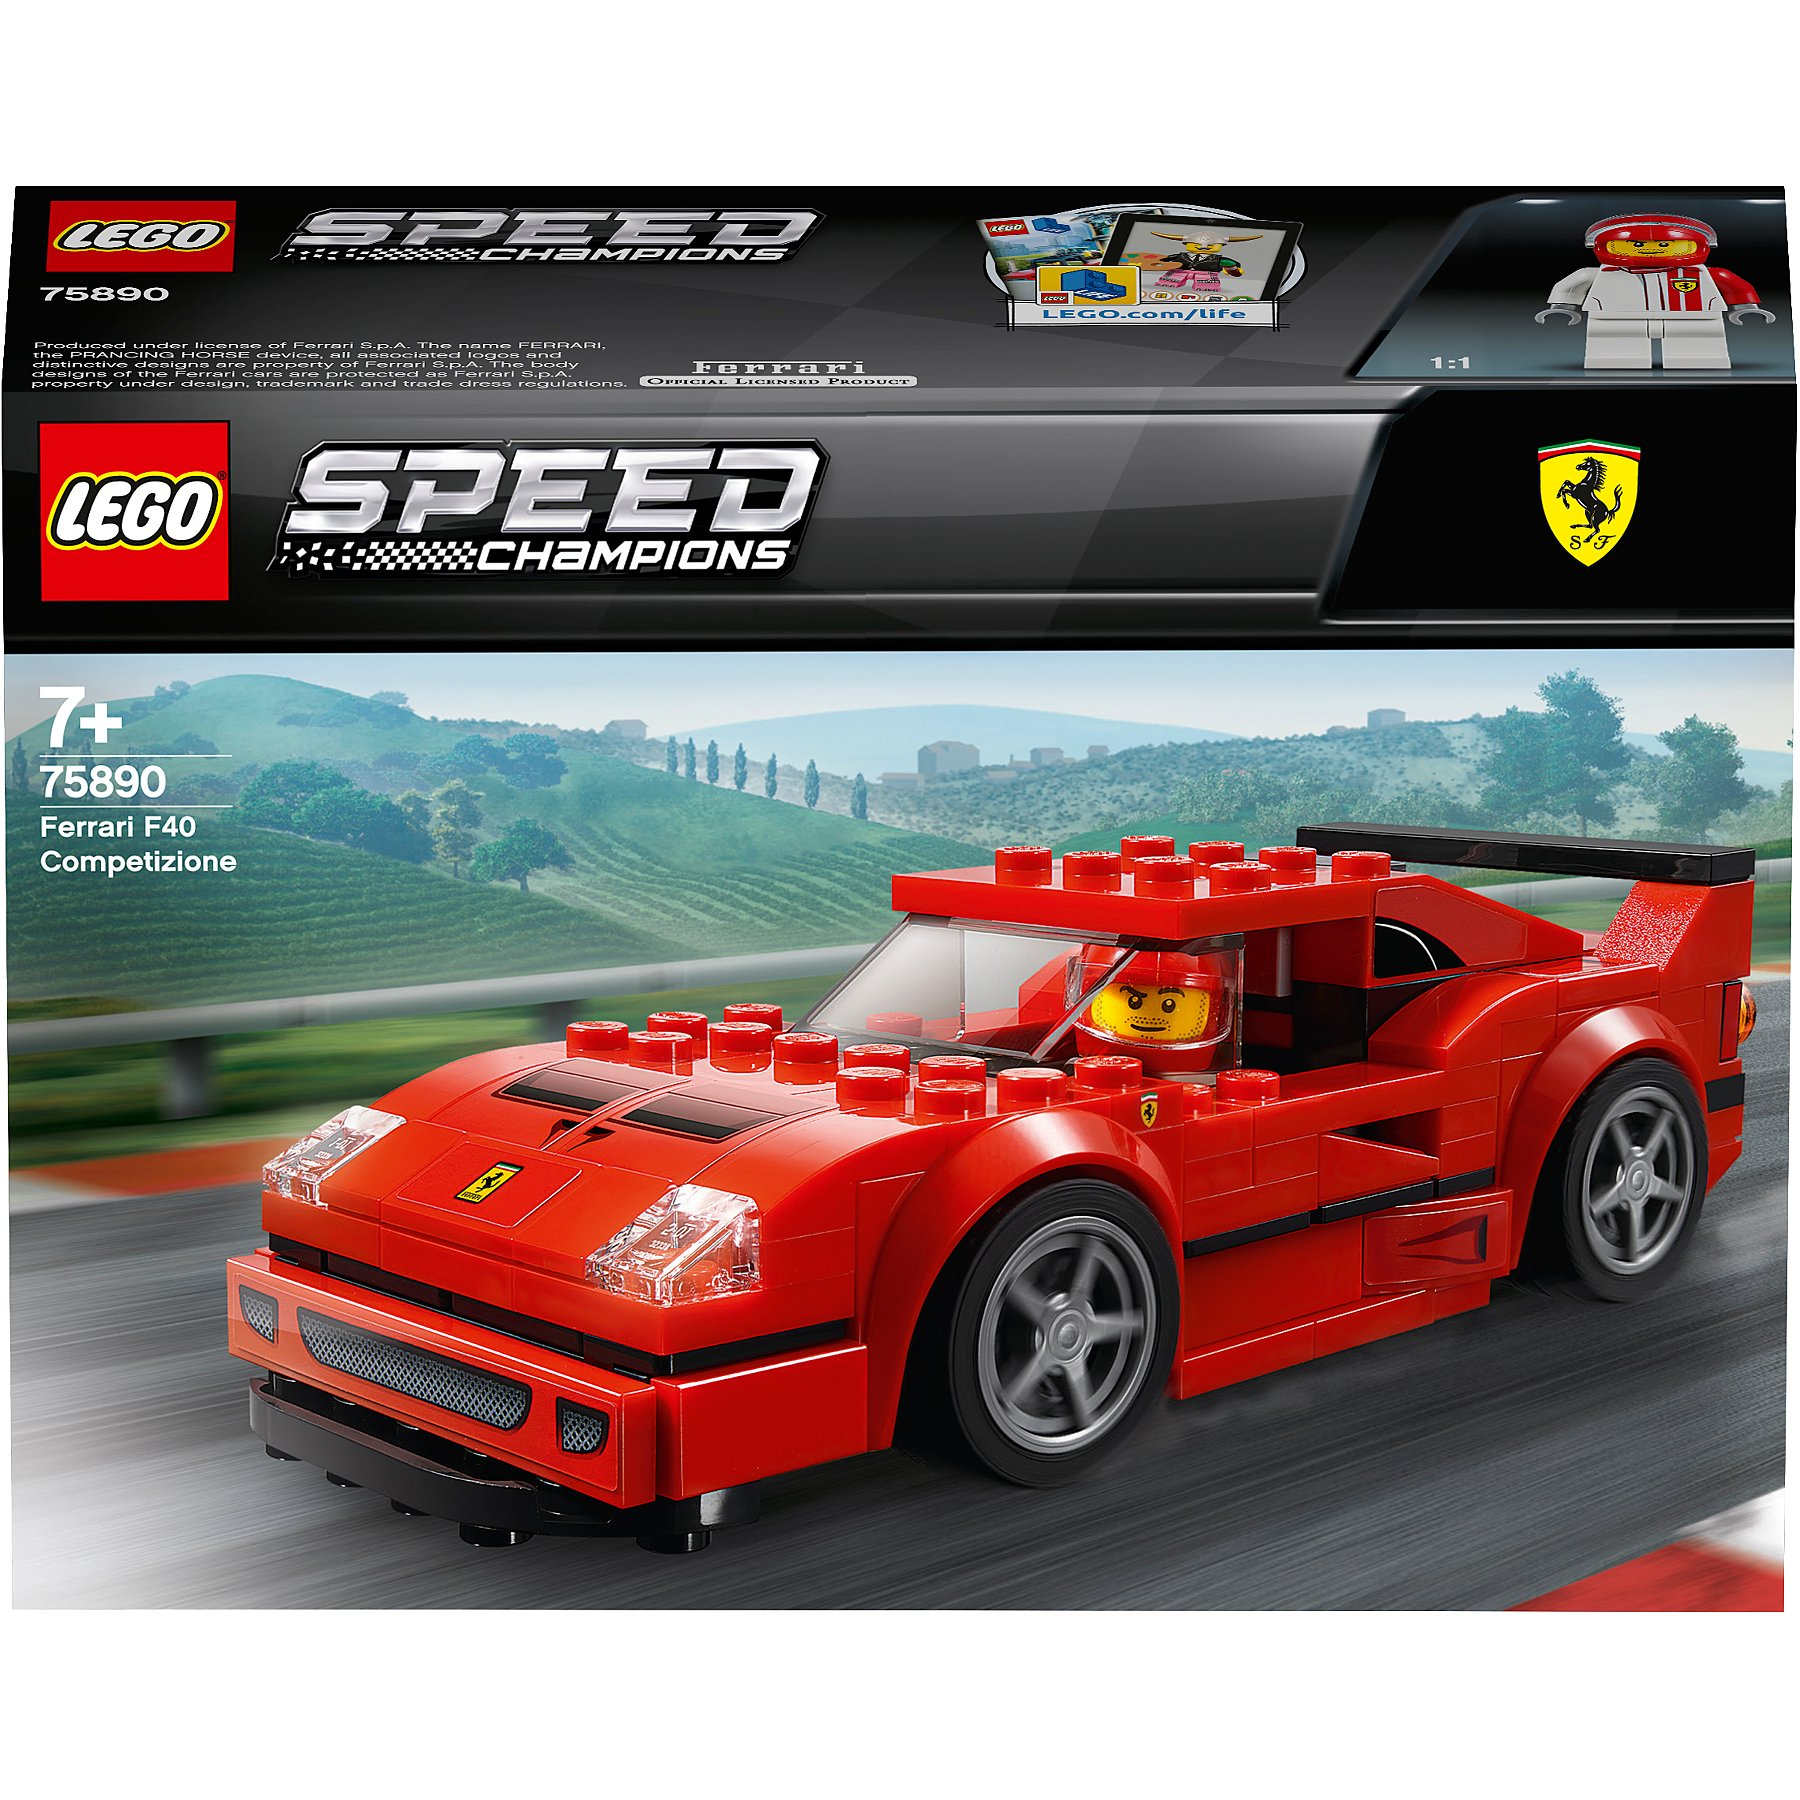 Lego Speed Champions 75890 Ferrari F40 Competizione Toys Character George